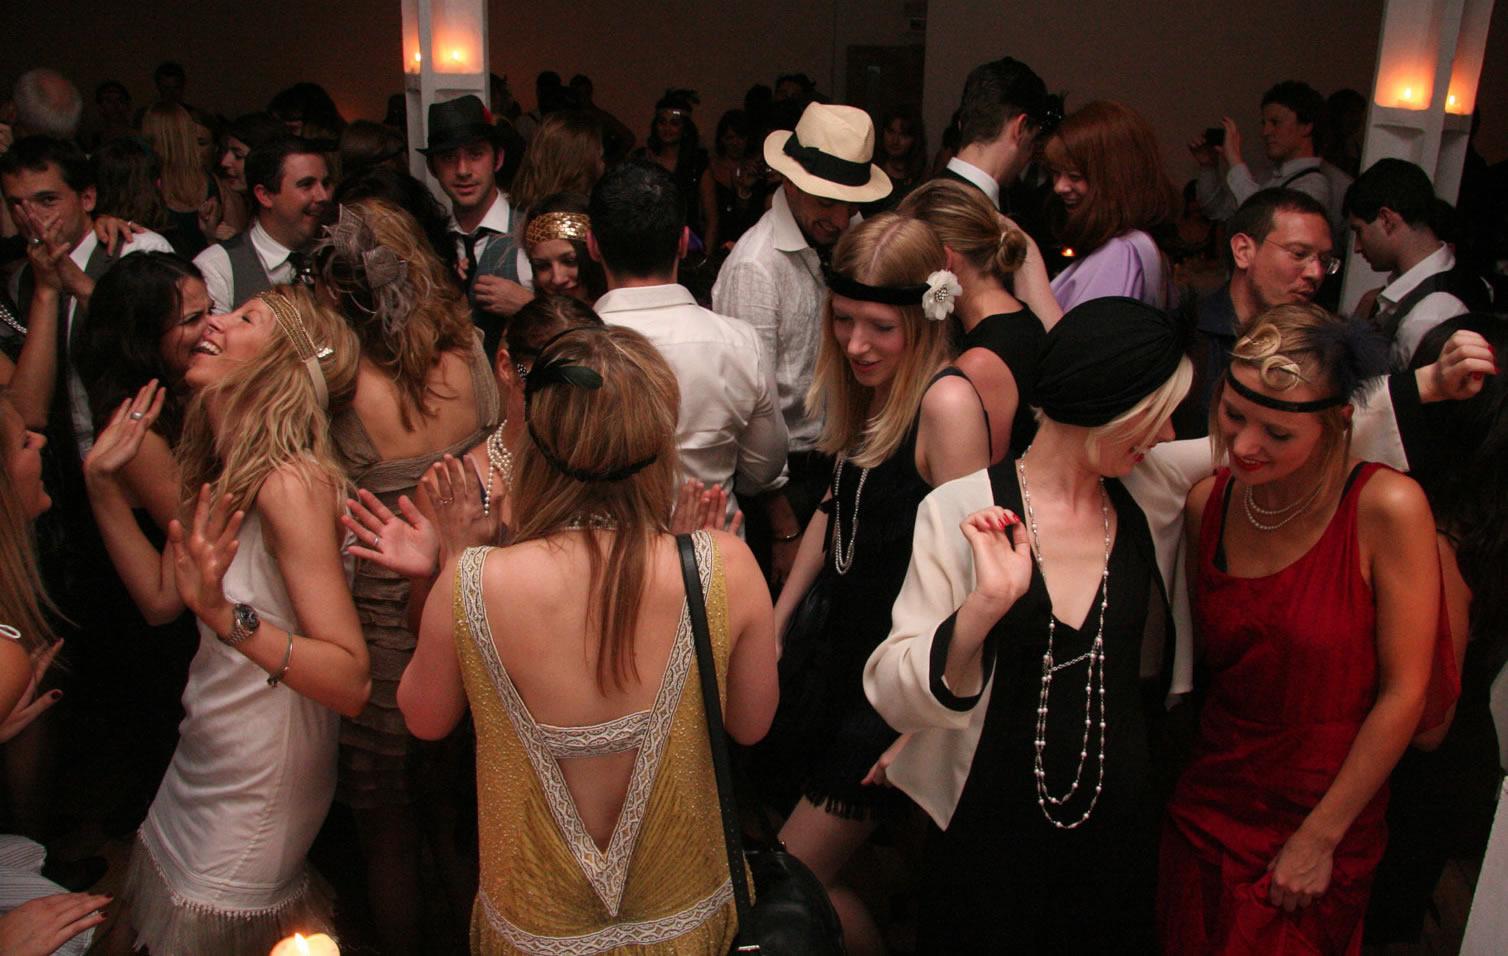 Sexy swingers parties london loves girls